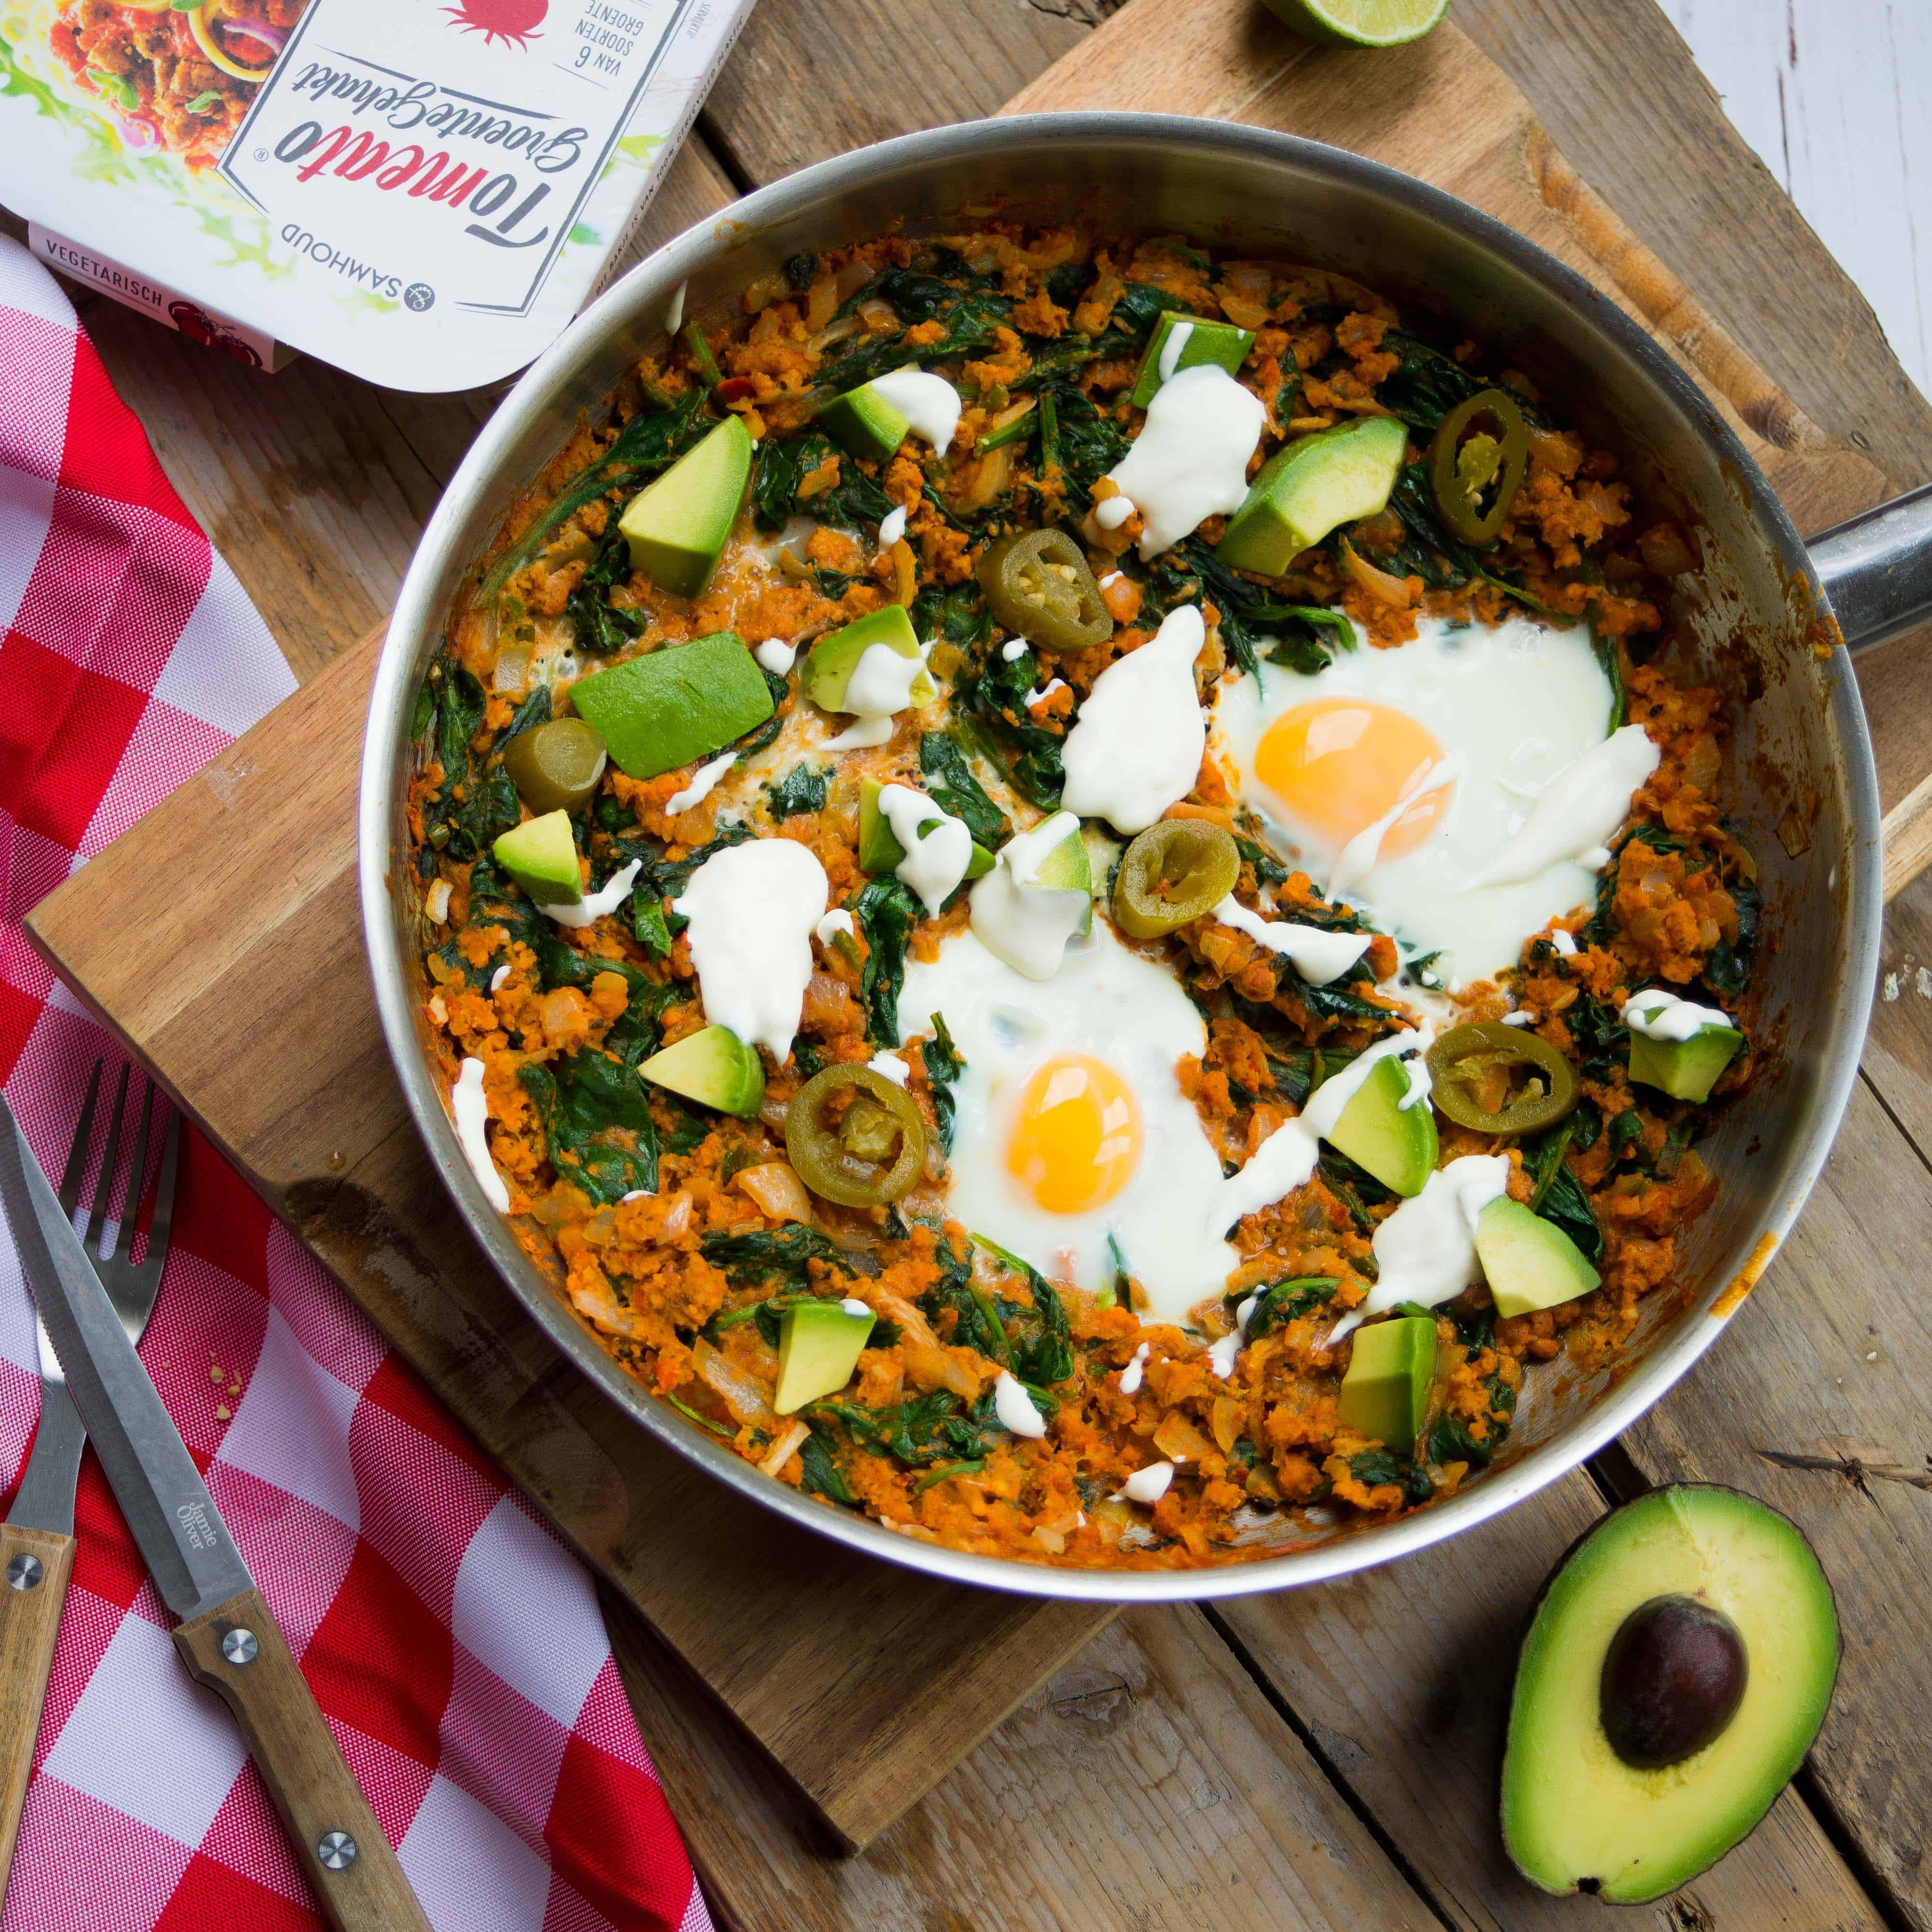 Mexicaanse shashuka, vegetarisch, &samhoud food, groentegehakt